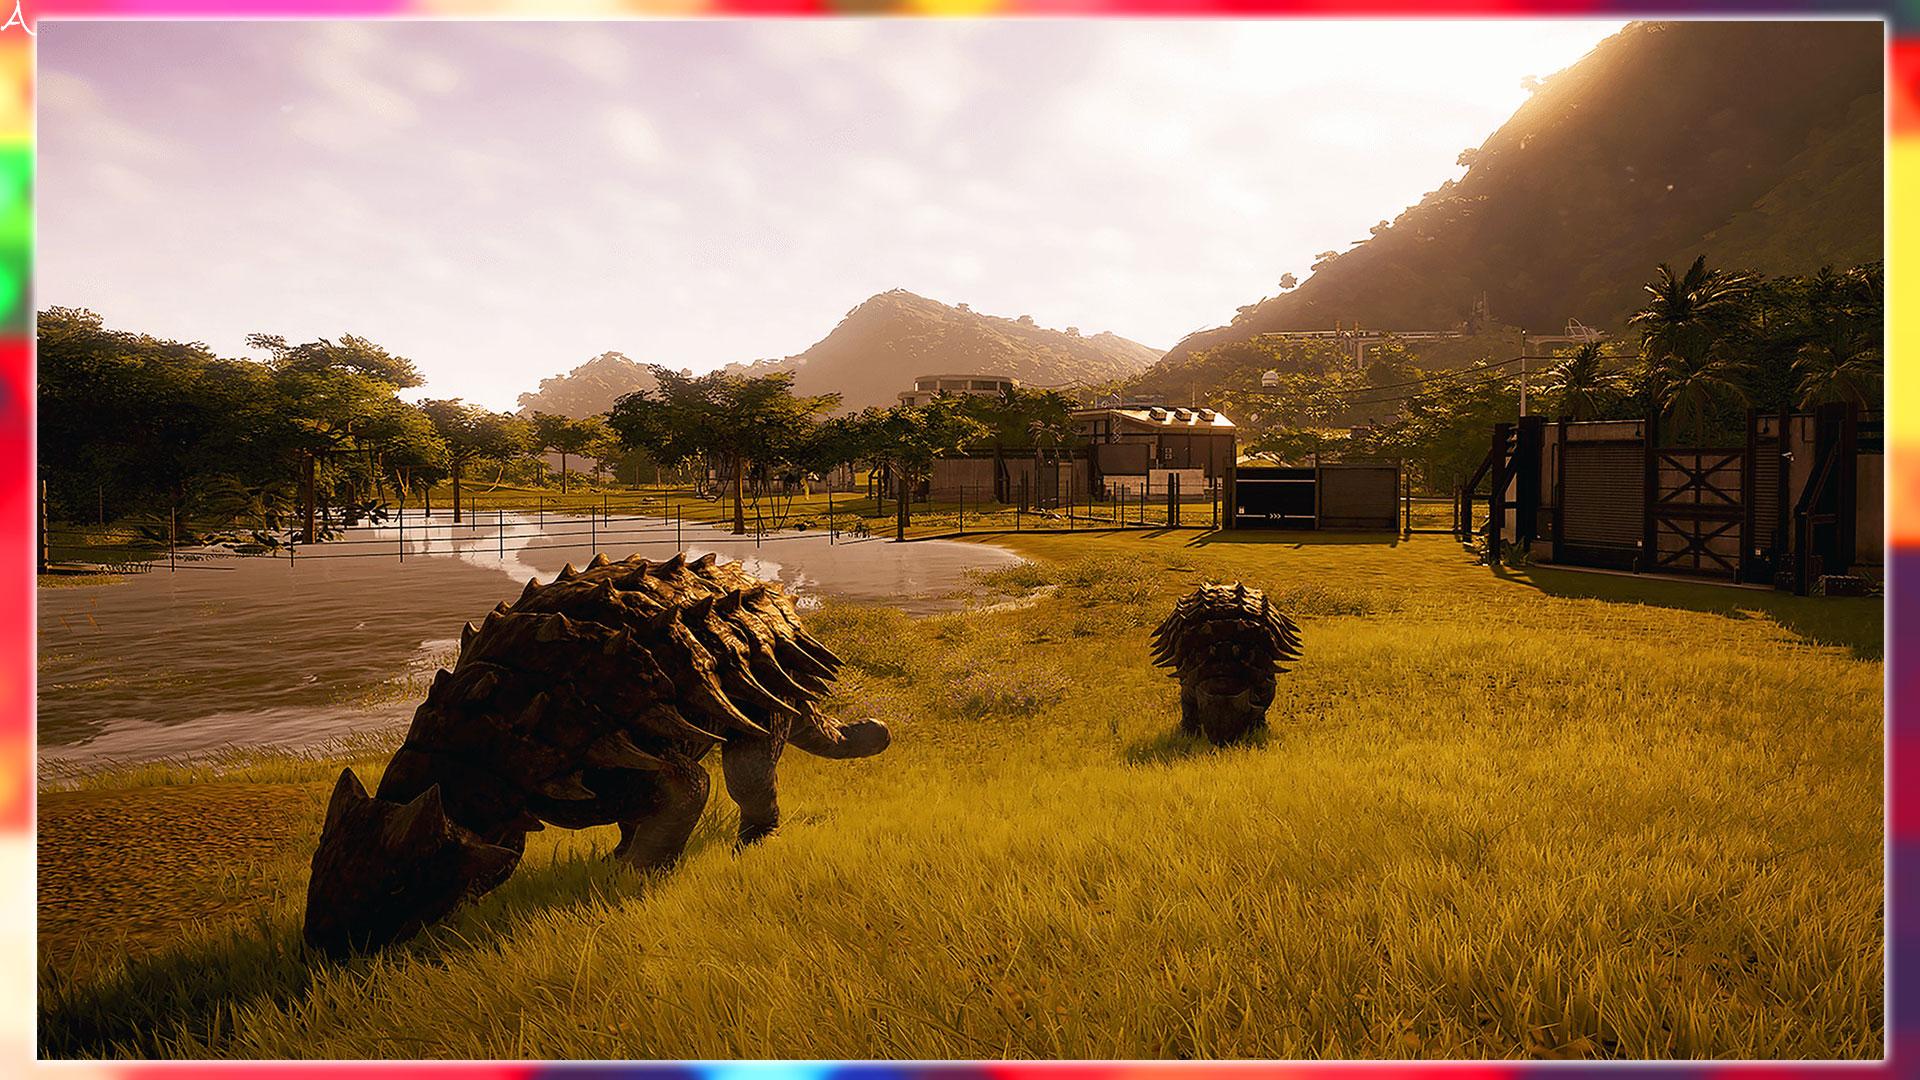 PC版「Jurassic World Evolution」に必要な最低/推奨スペックを確認